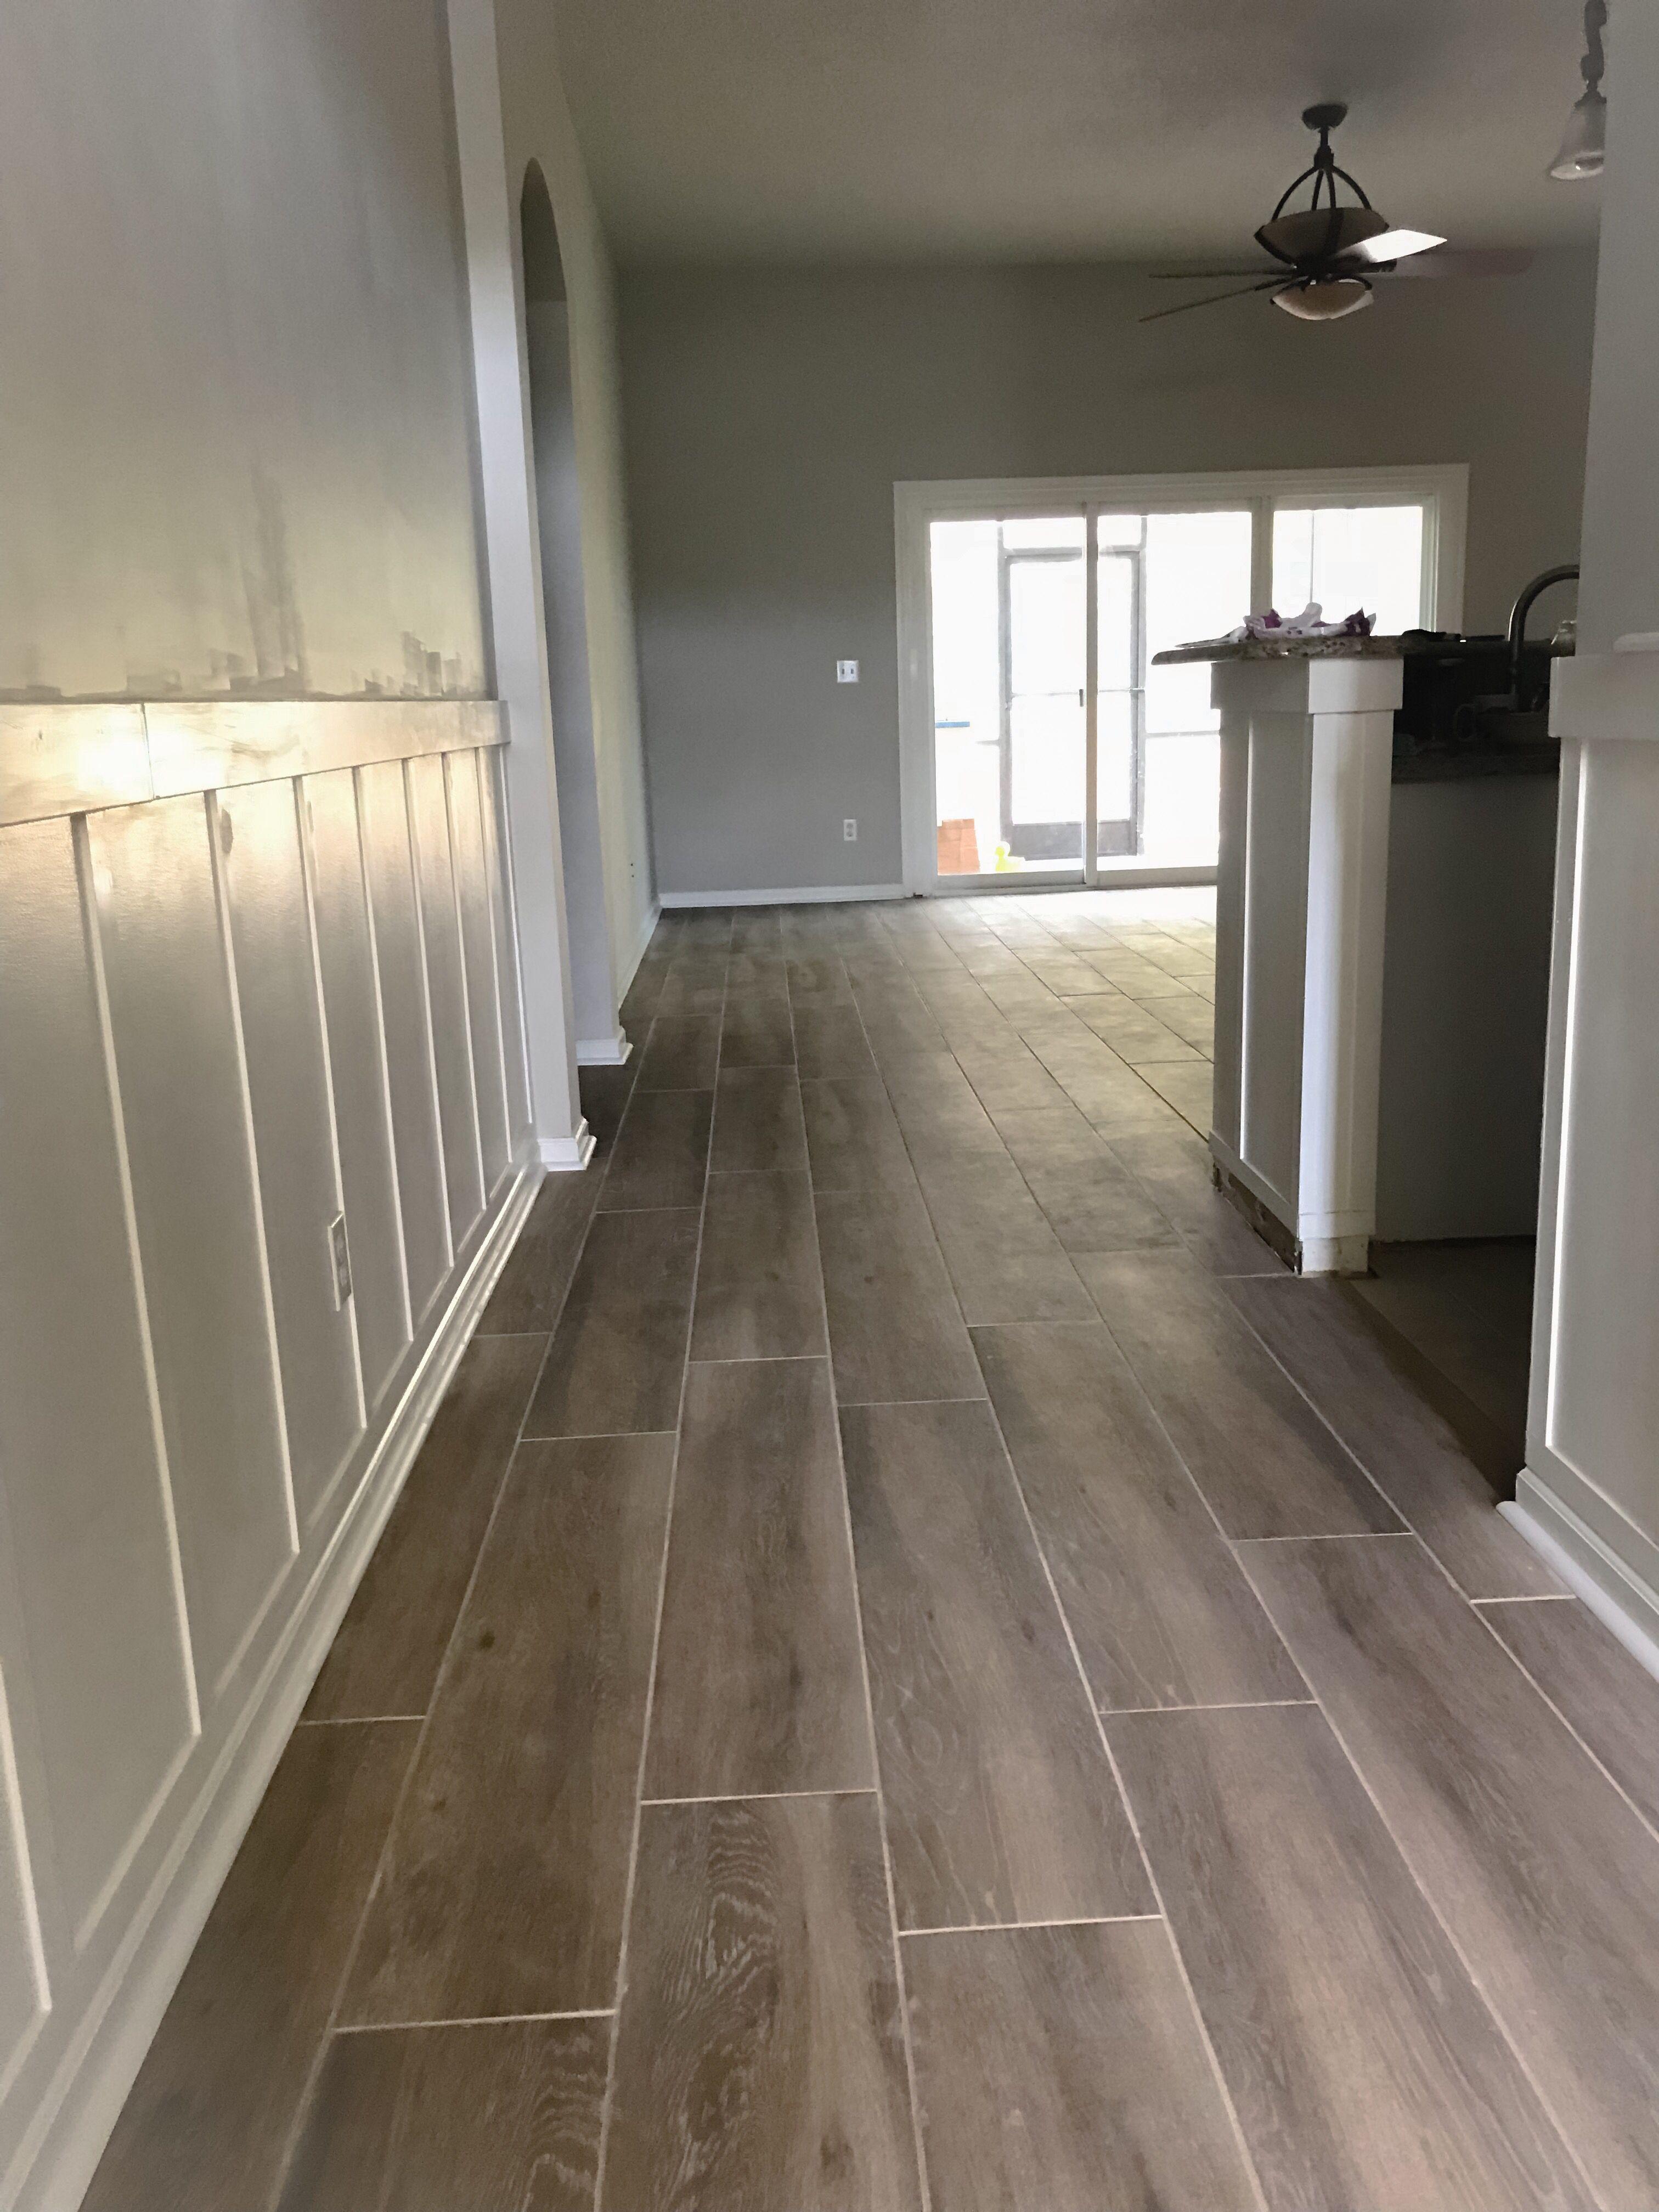 Home Improvement Plank Tile Flooring Wood Look Tile Floor Wood